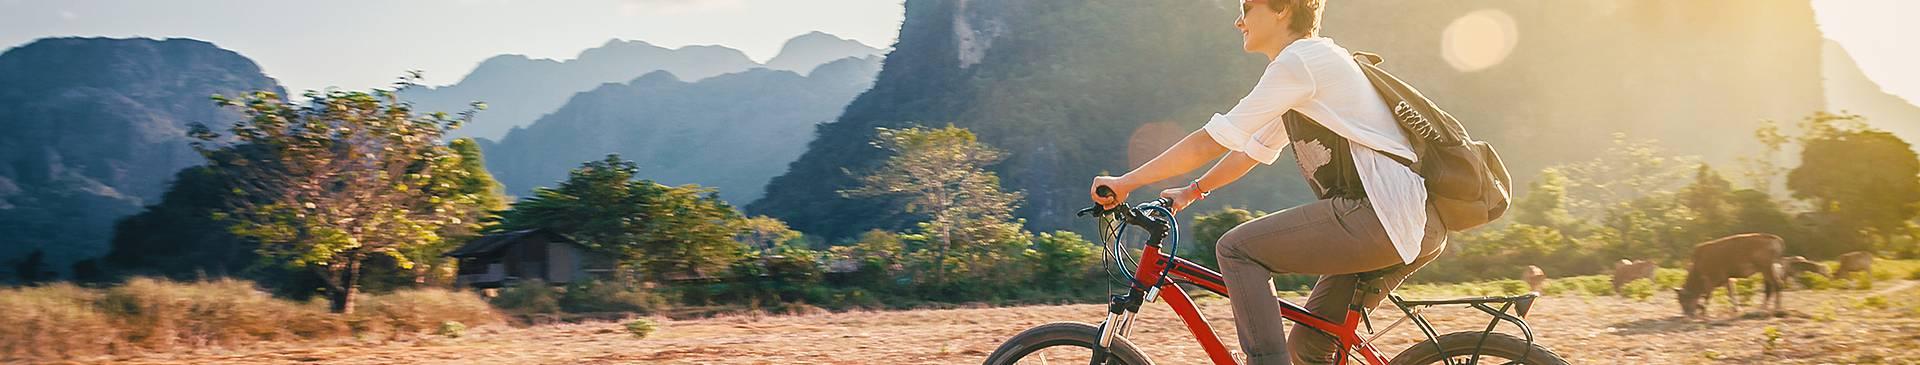 Laos cycling trips